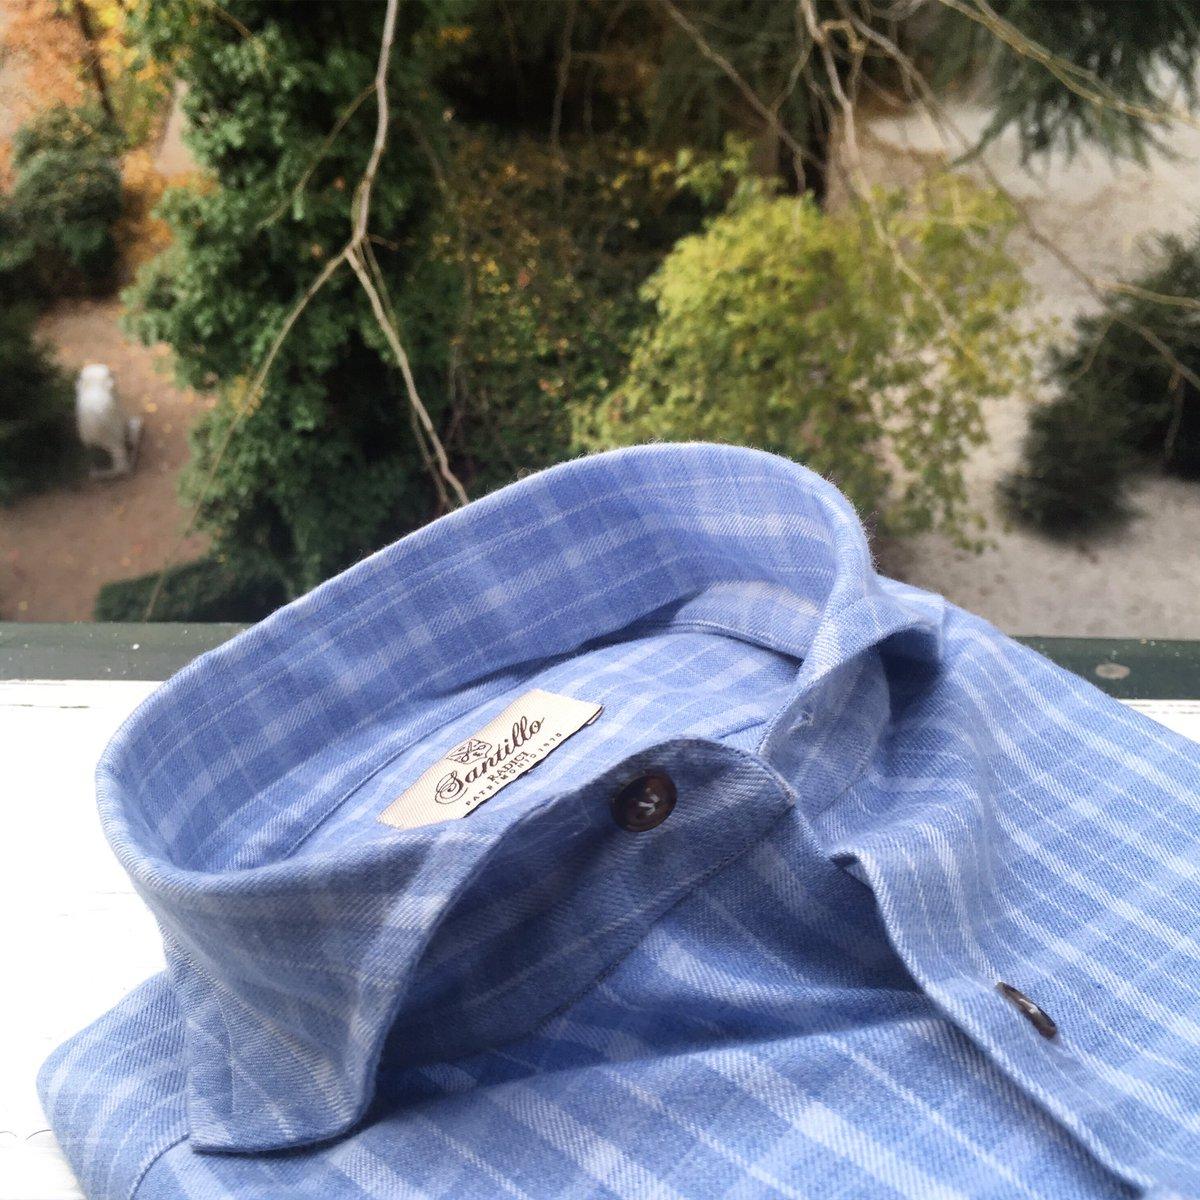 From latest collection available Now #PENTEDATTILO Sky blue check radici patrimonio 1970 half-placket shirt   #check #madras #cashmere #comfortneverwithoutelegance #radiciproject #inspiration #fw20 #gentlemantips #timeless #elegance  #archive  #handmadeinitalypic.twitter.com/AeEPwG7Kbe